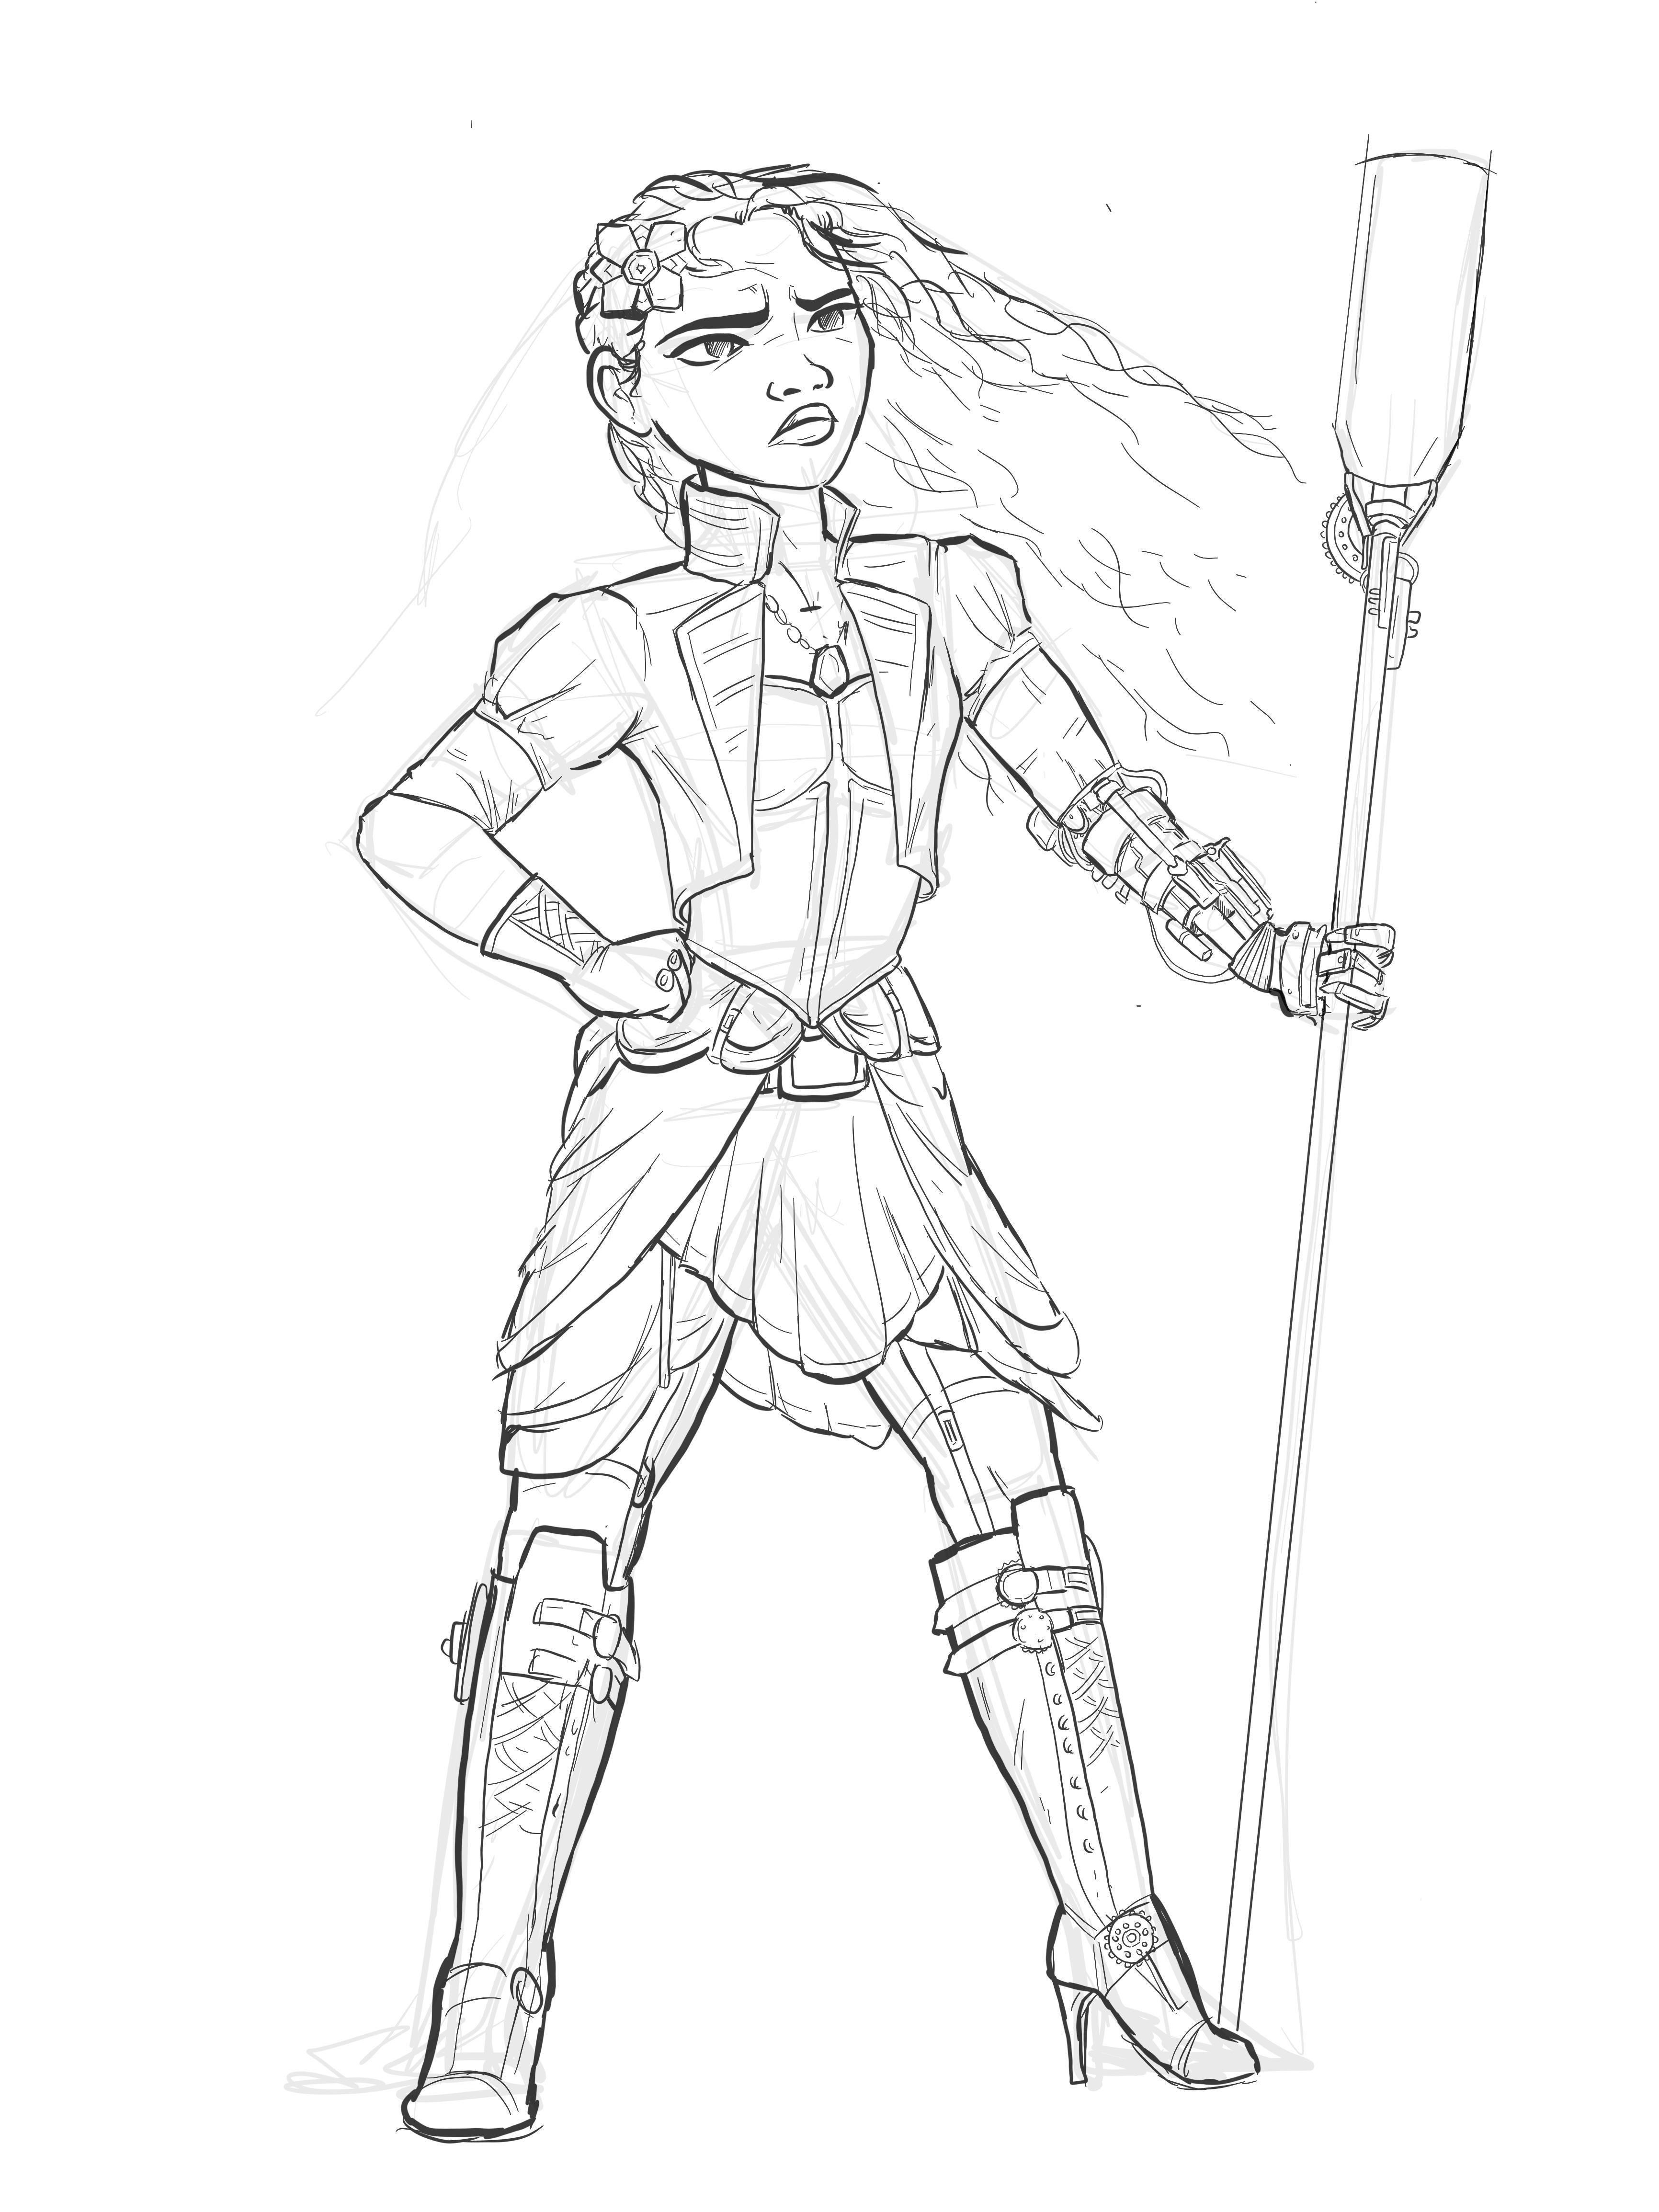 3464x4618 In Progress Moana Steampunk Concept Art. Any Critique